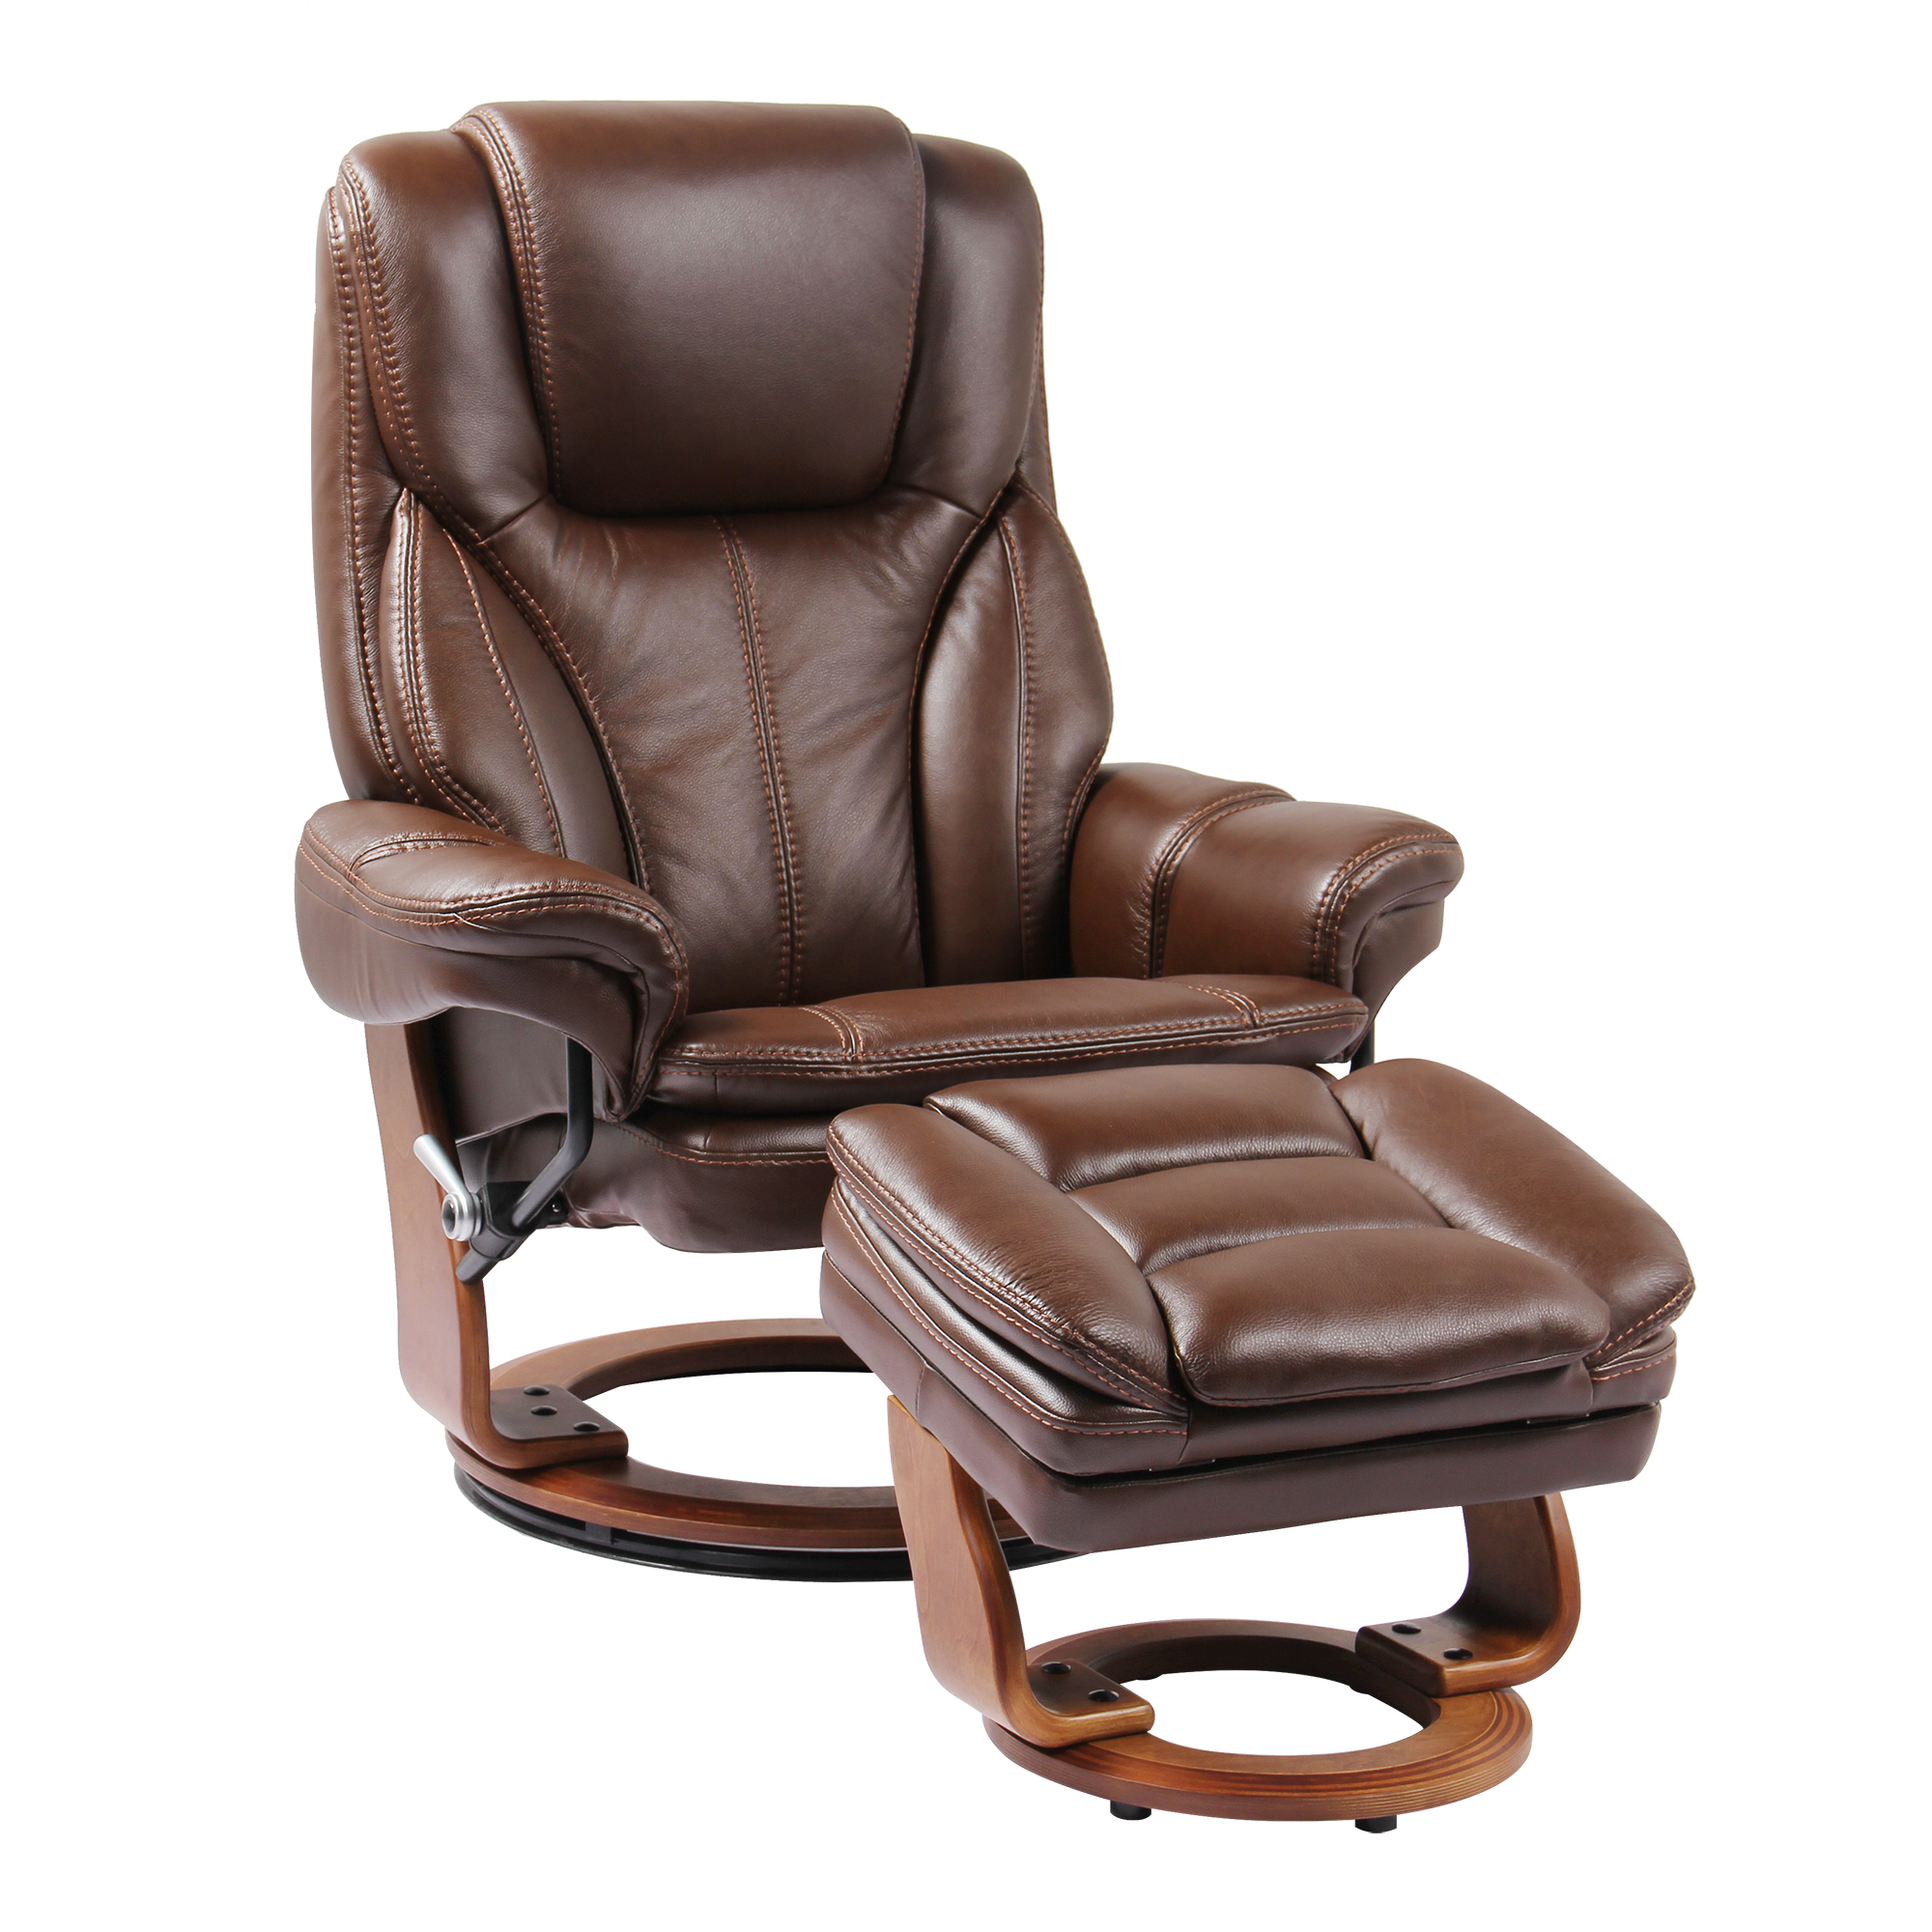 Stress Free Hana Reclining Chair And Ottoman Comfort